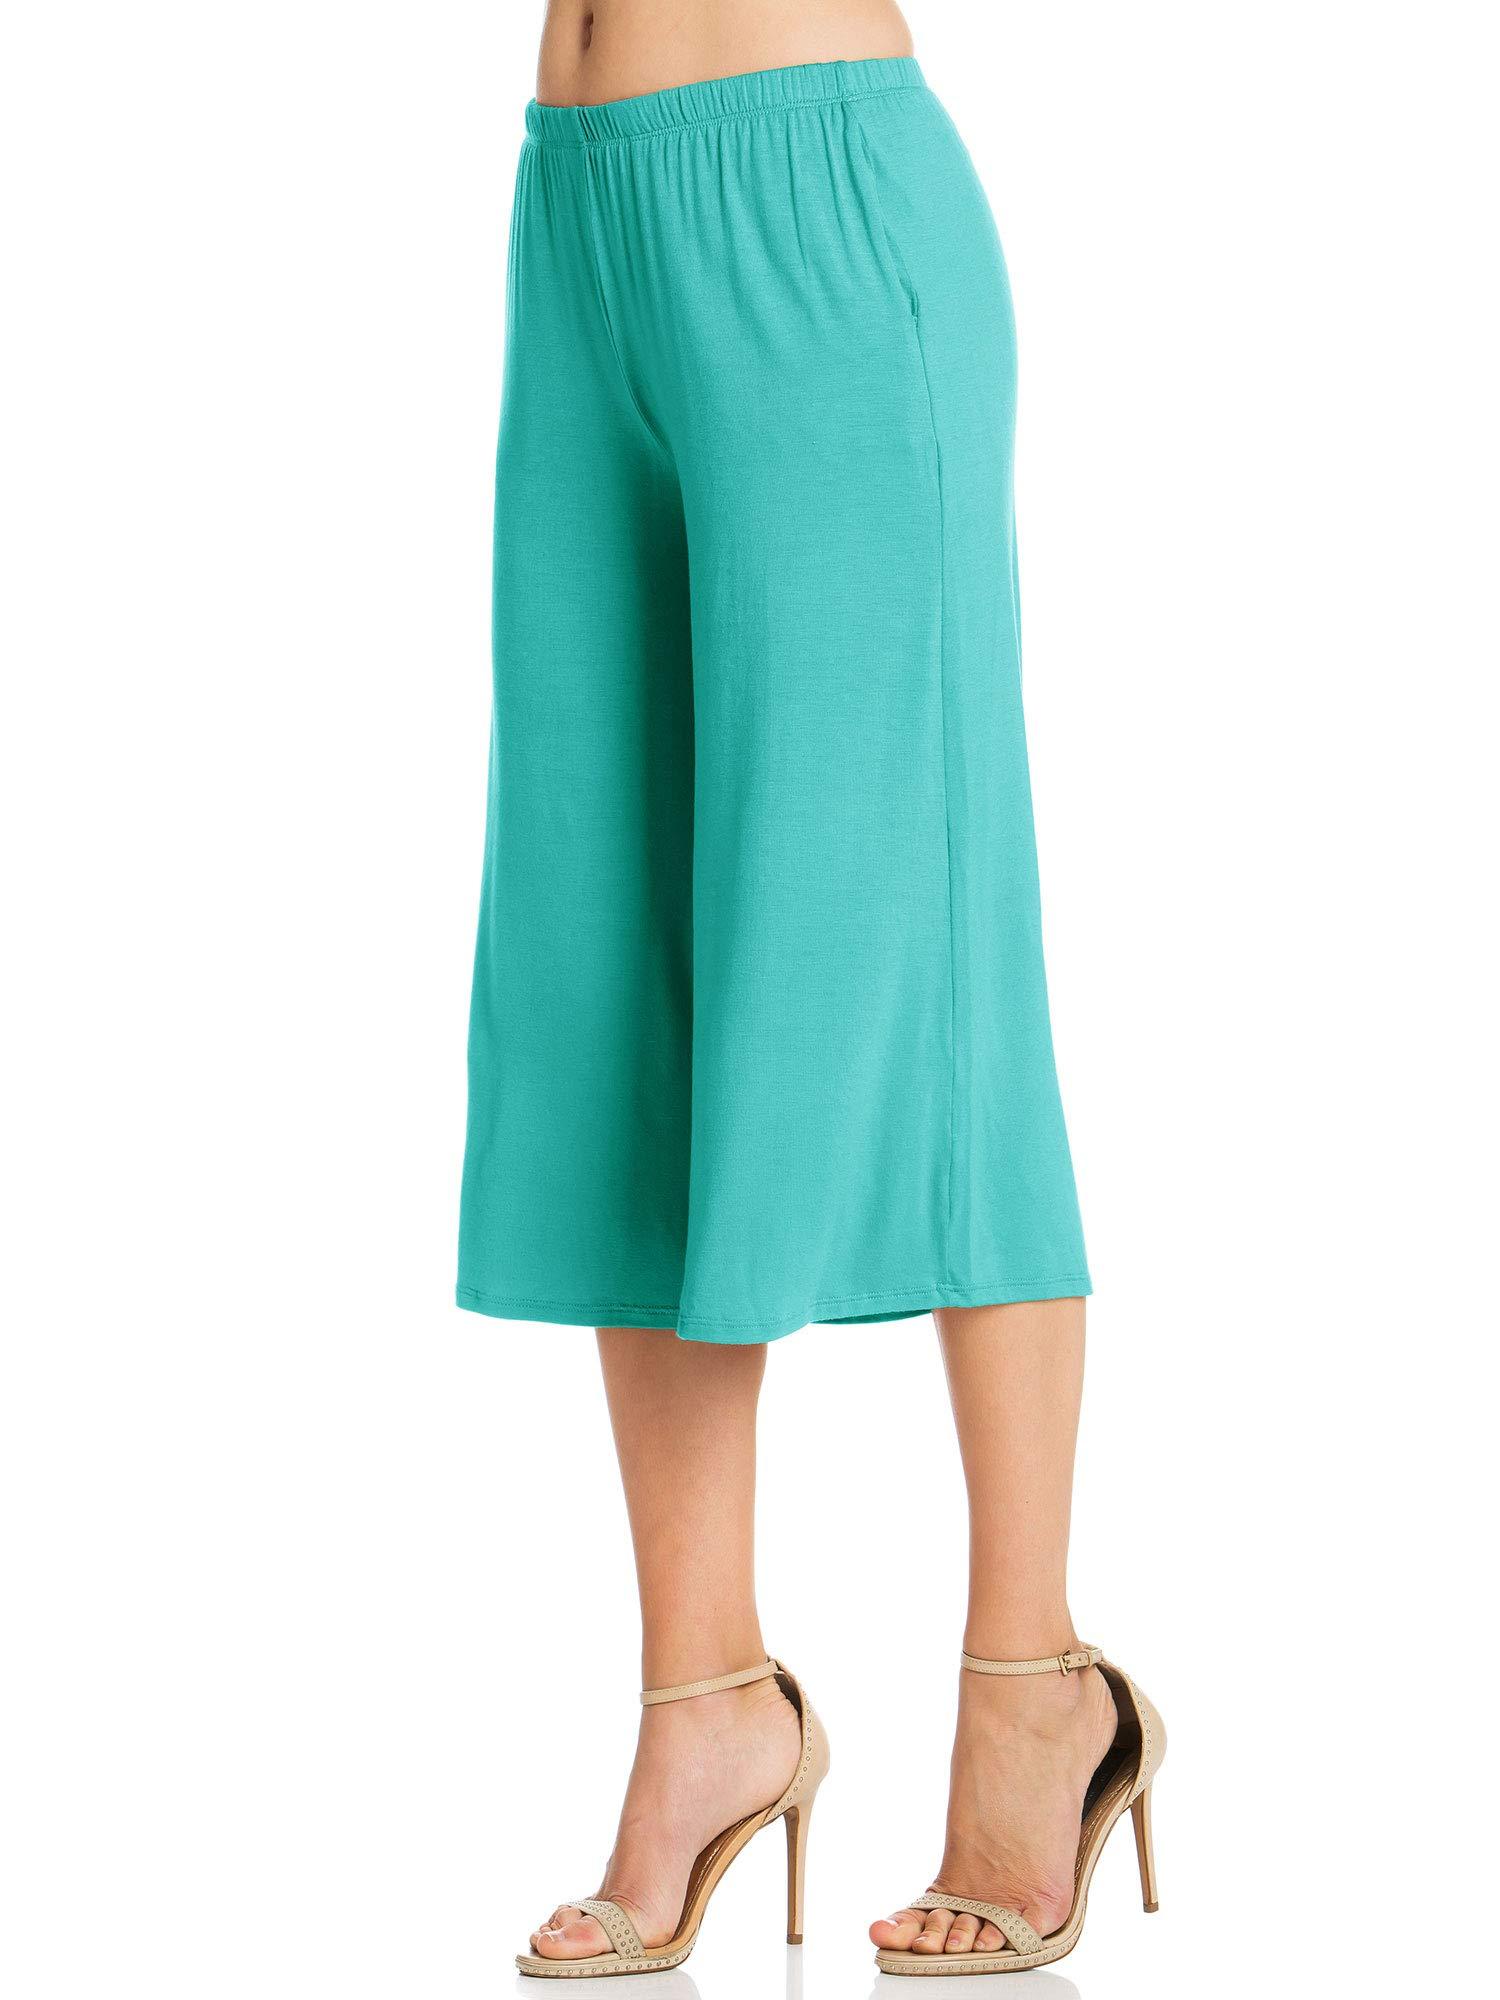 Fashion California Womens 1 Pack Elastic Waist Jersey Culottes Capri Pocket Pants (XXXXX-Large, Aqua) by Fashion California (Image #3)